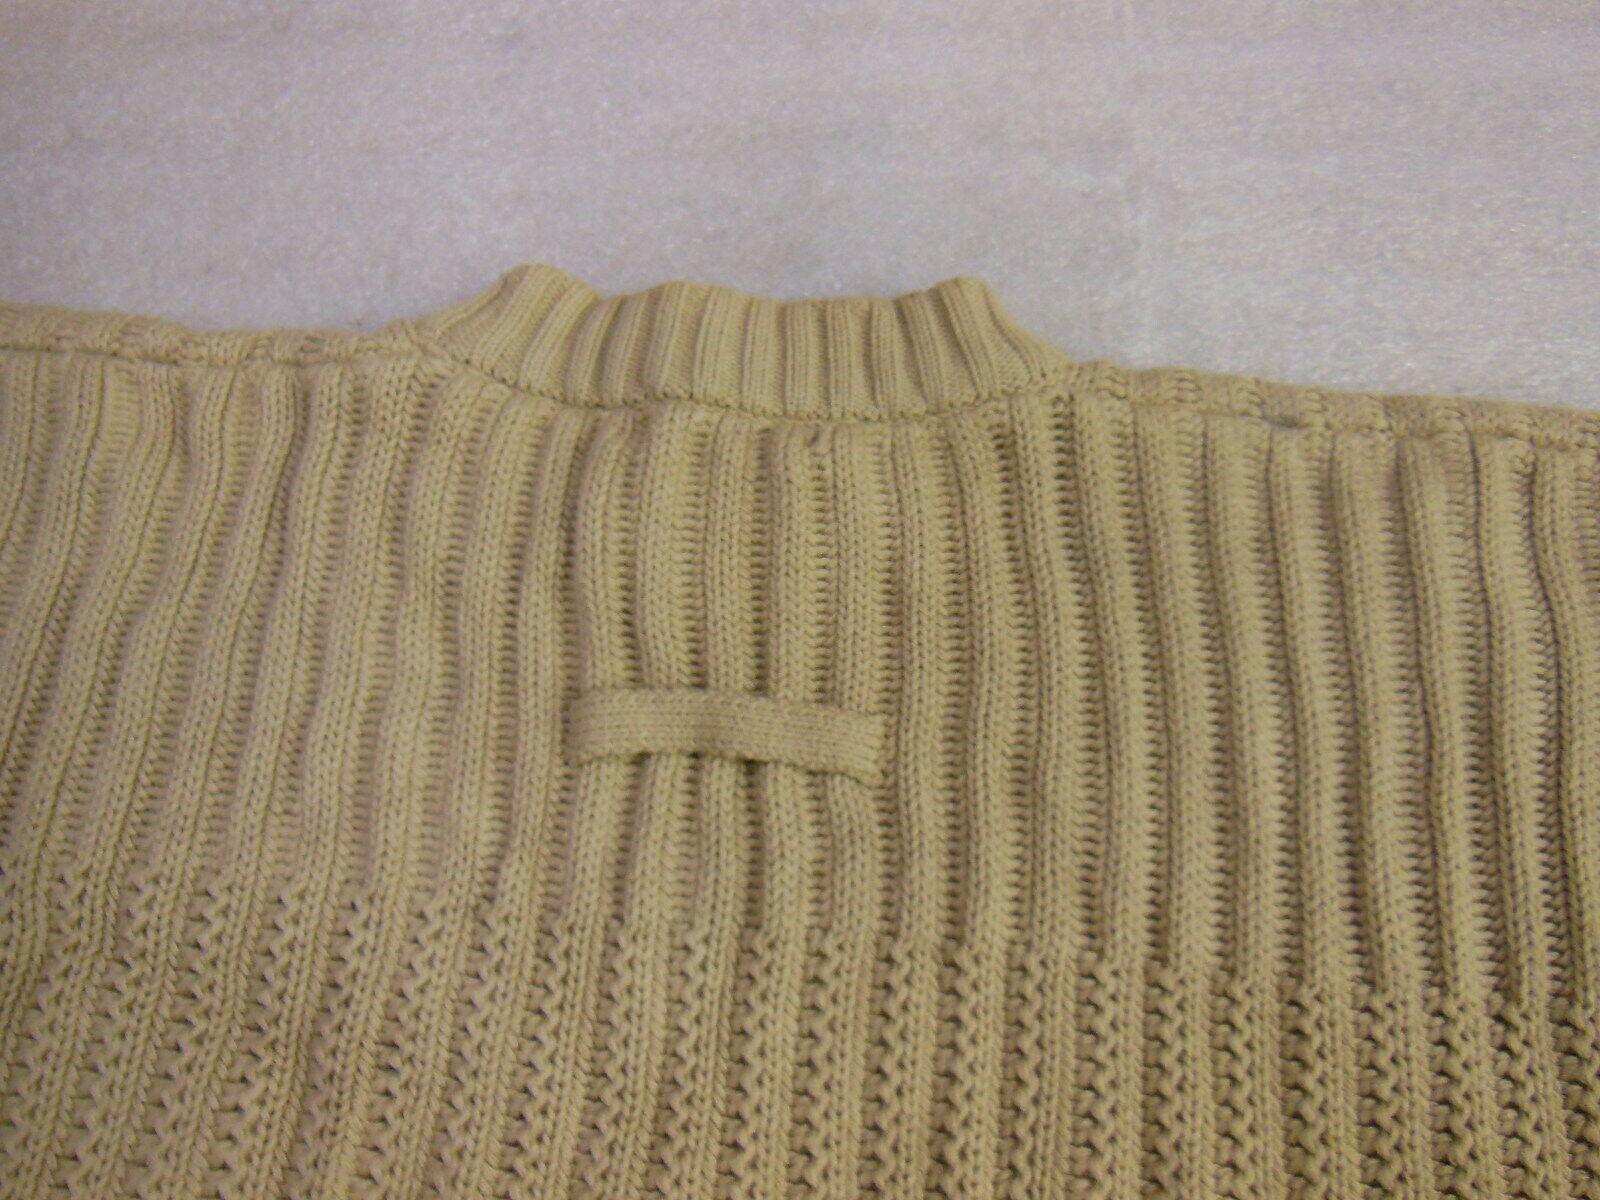 KIKIT Maurice Sasson 100% Cotton Women's Sweater - Size Size Size L fd1a9c